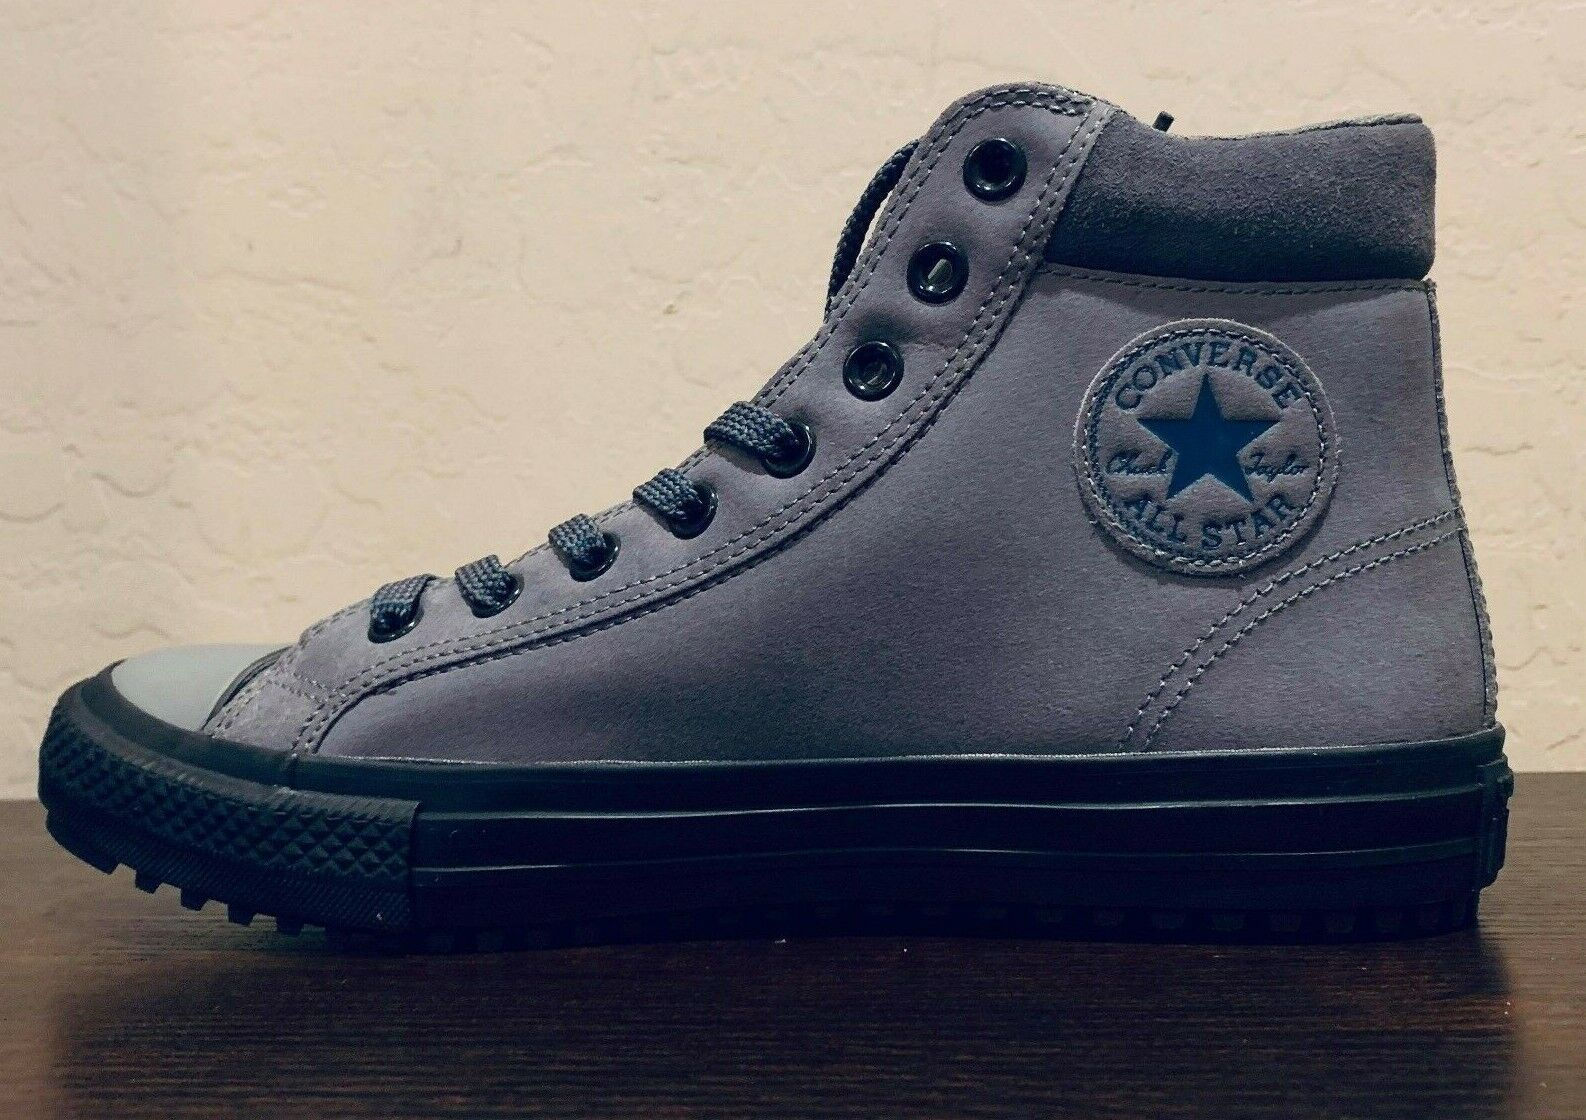 converse work boots